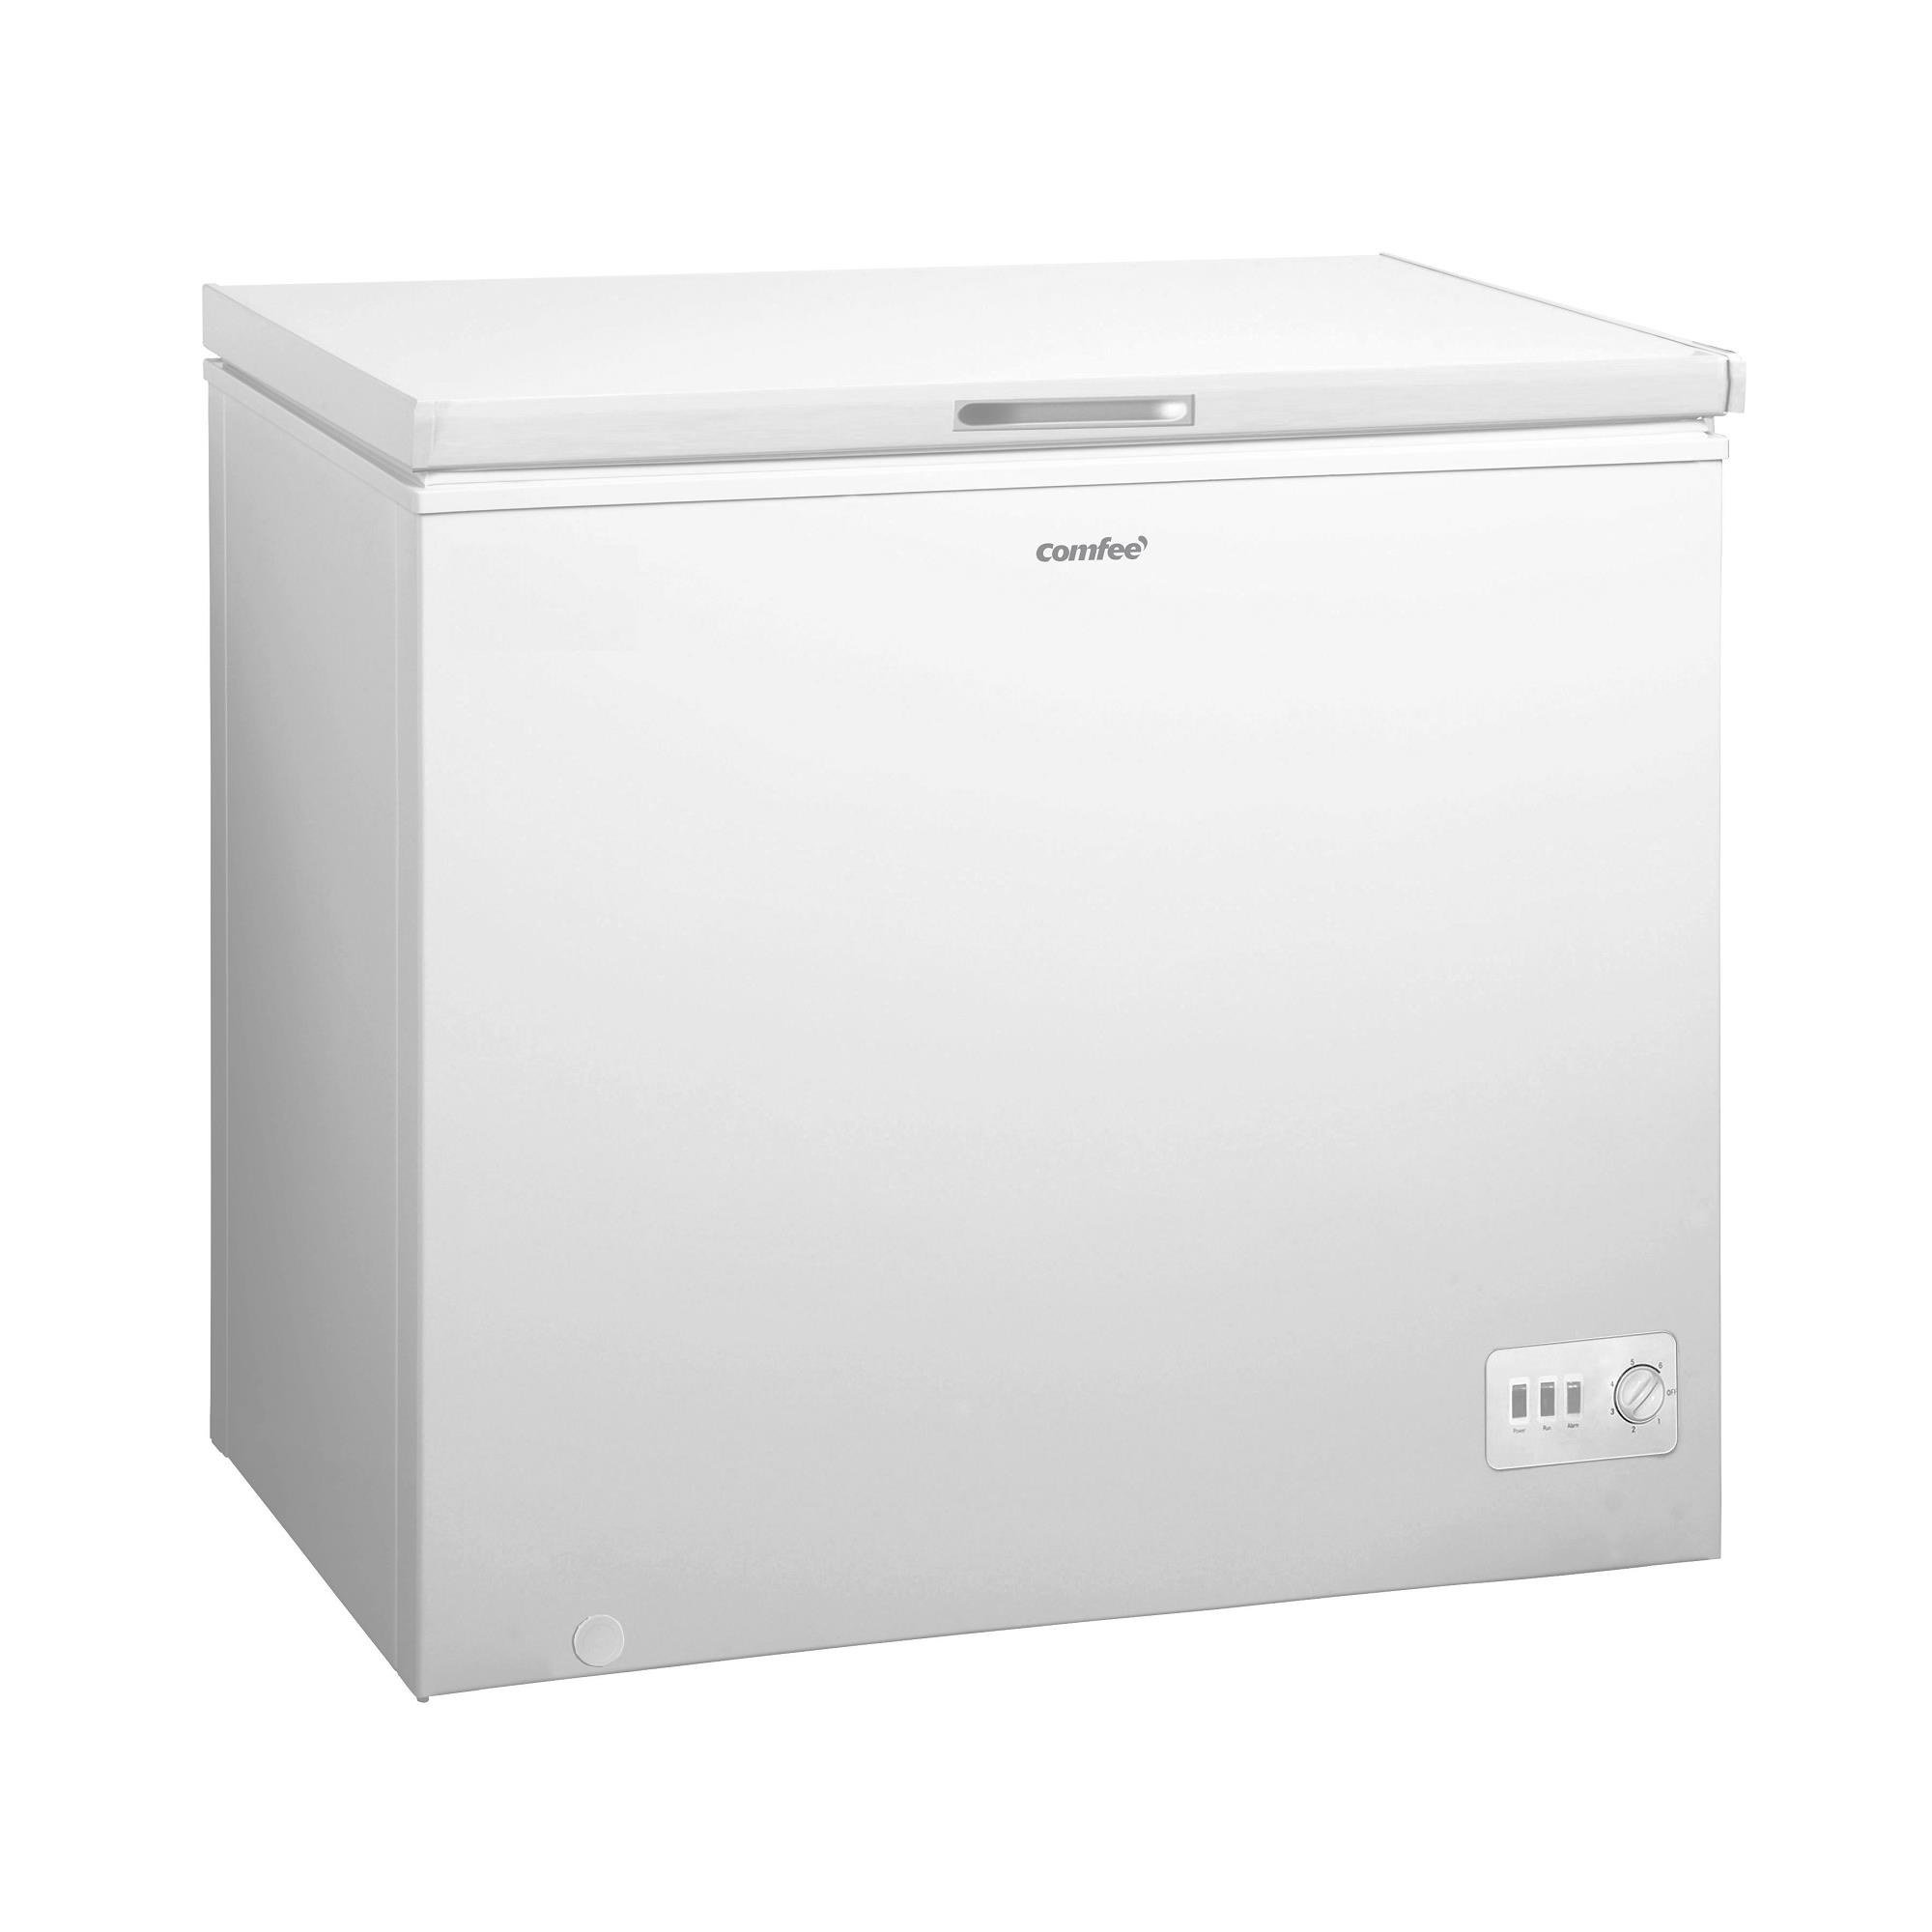 COMFEE Congelatore orizzontale 203 lt A+